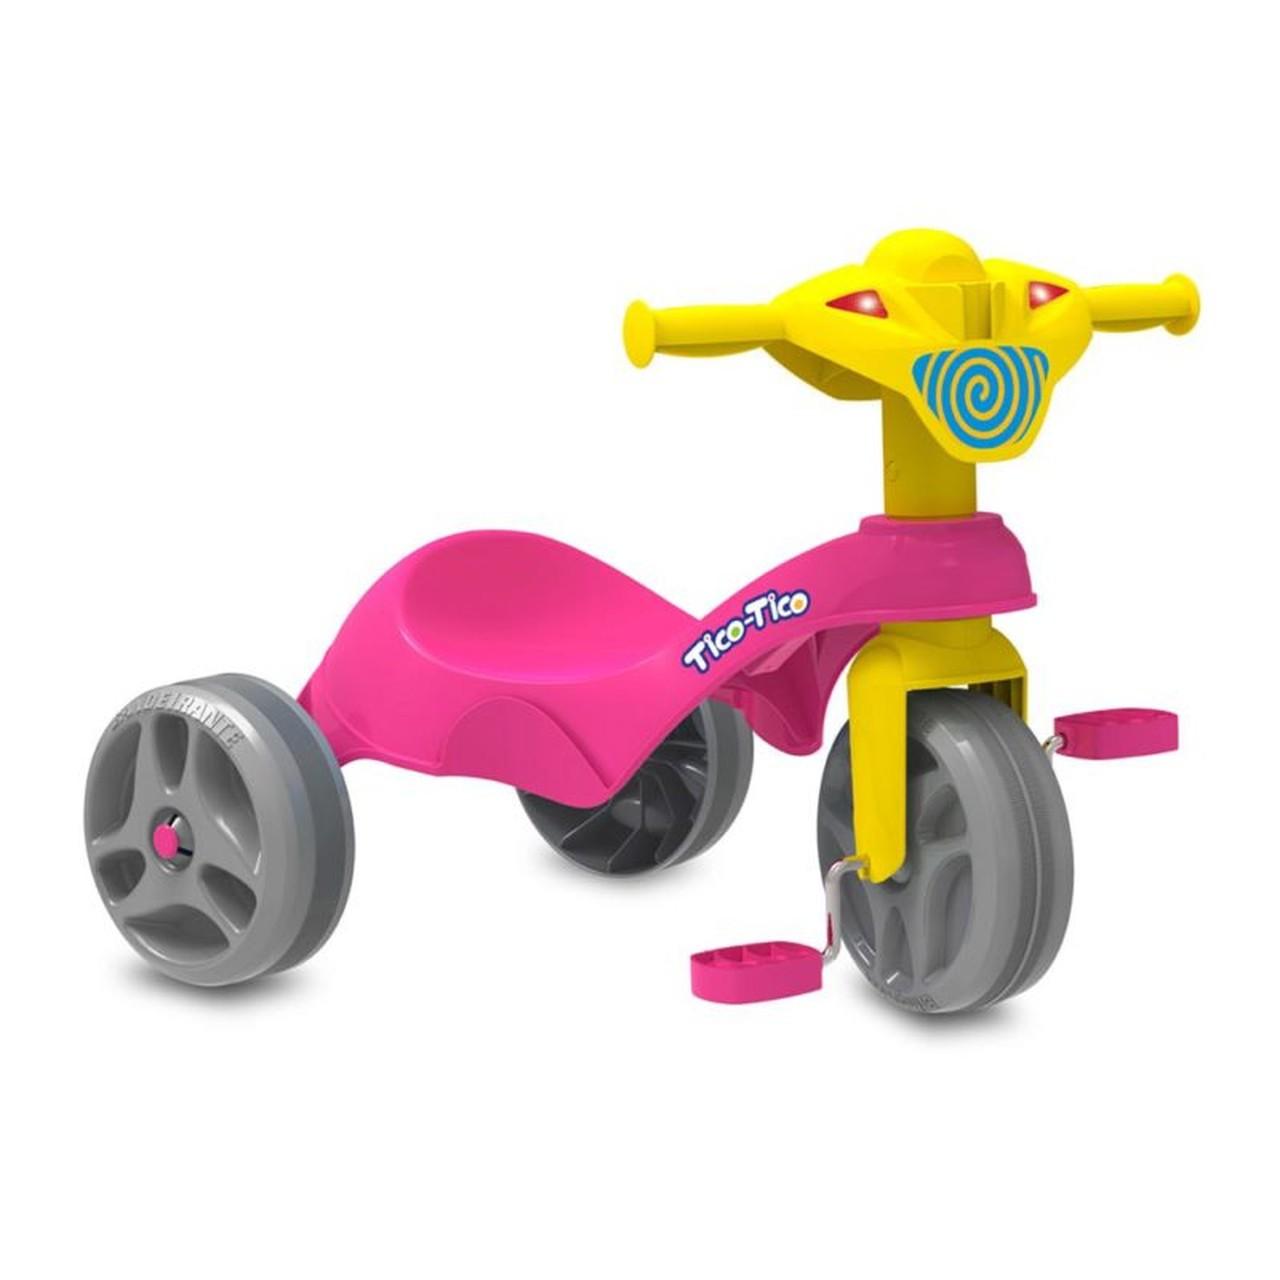 Triciclo Tico - Tico Club Rosa - Bandeirante 683